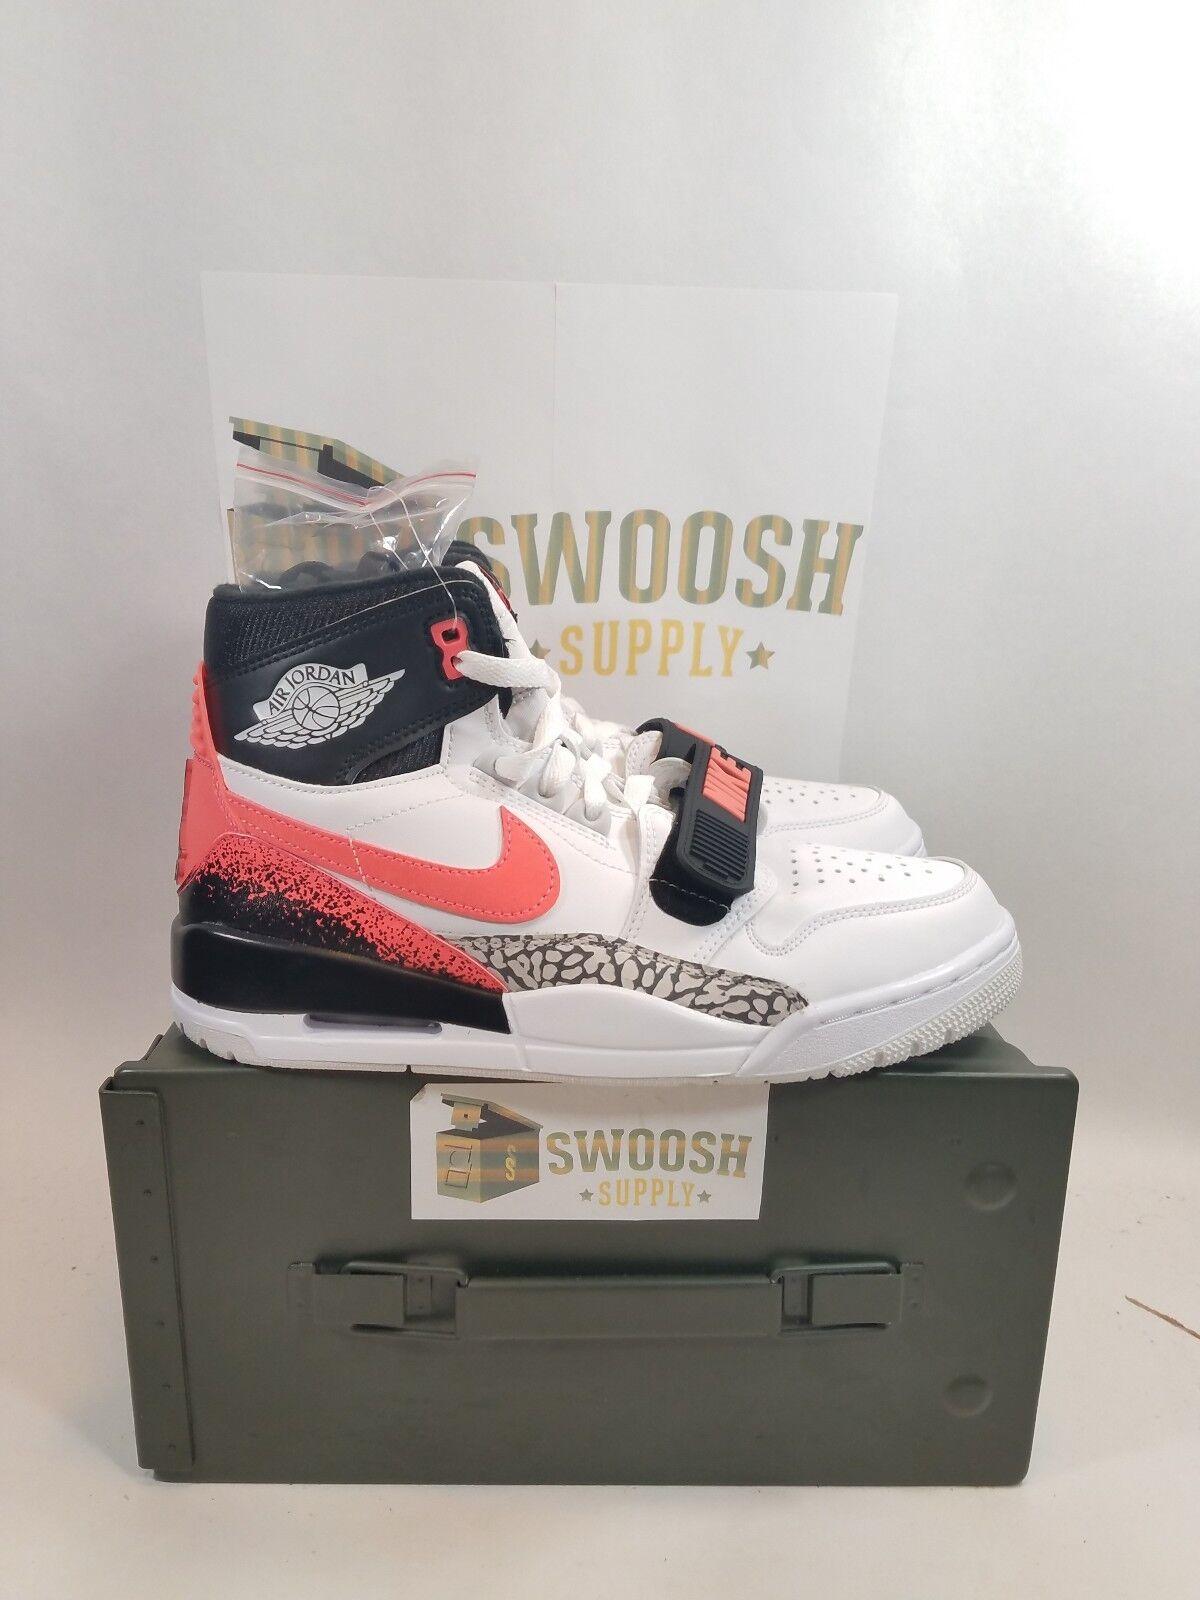 71bdd7ca4e Nike Just Don x Air Jordan Legacy 312 Hot Lava Agassi AQ4160-108 12.5 NEW  Size noqrib3053-Athletic Shoes